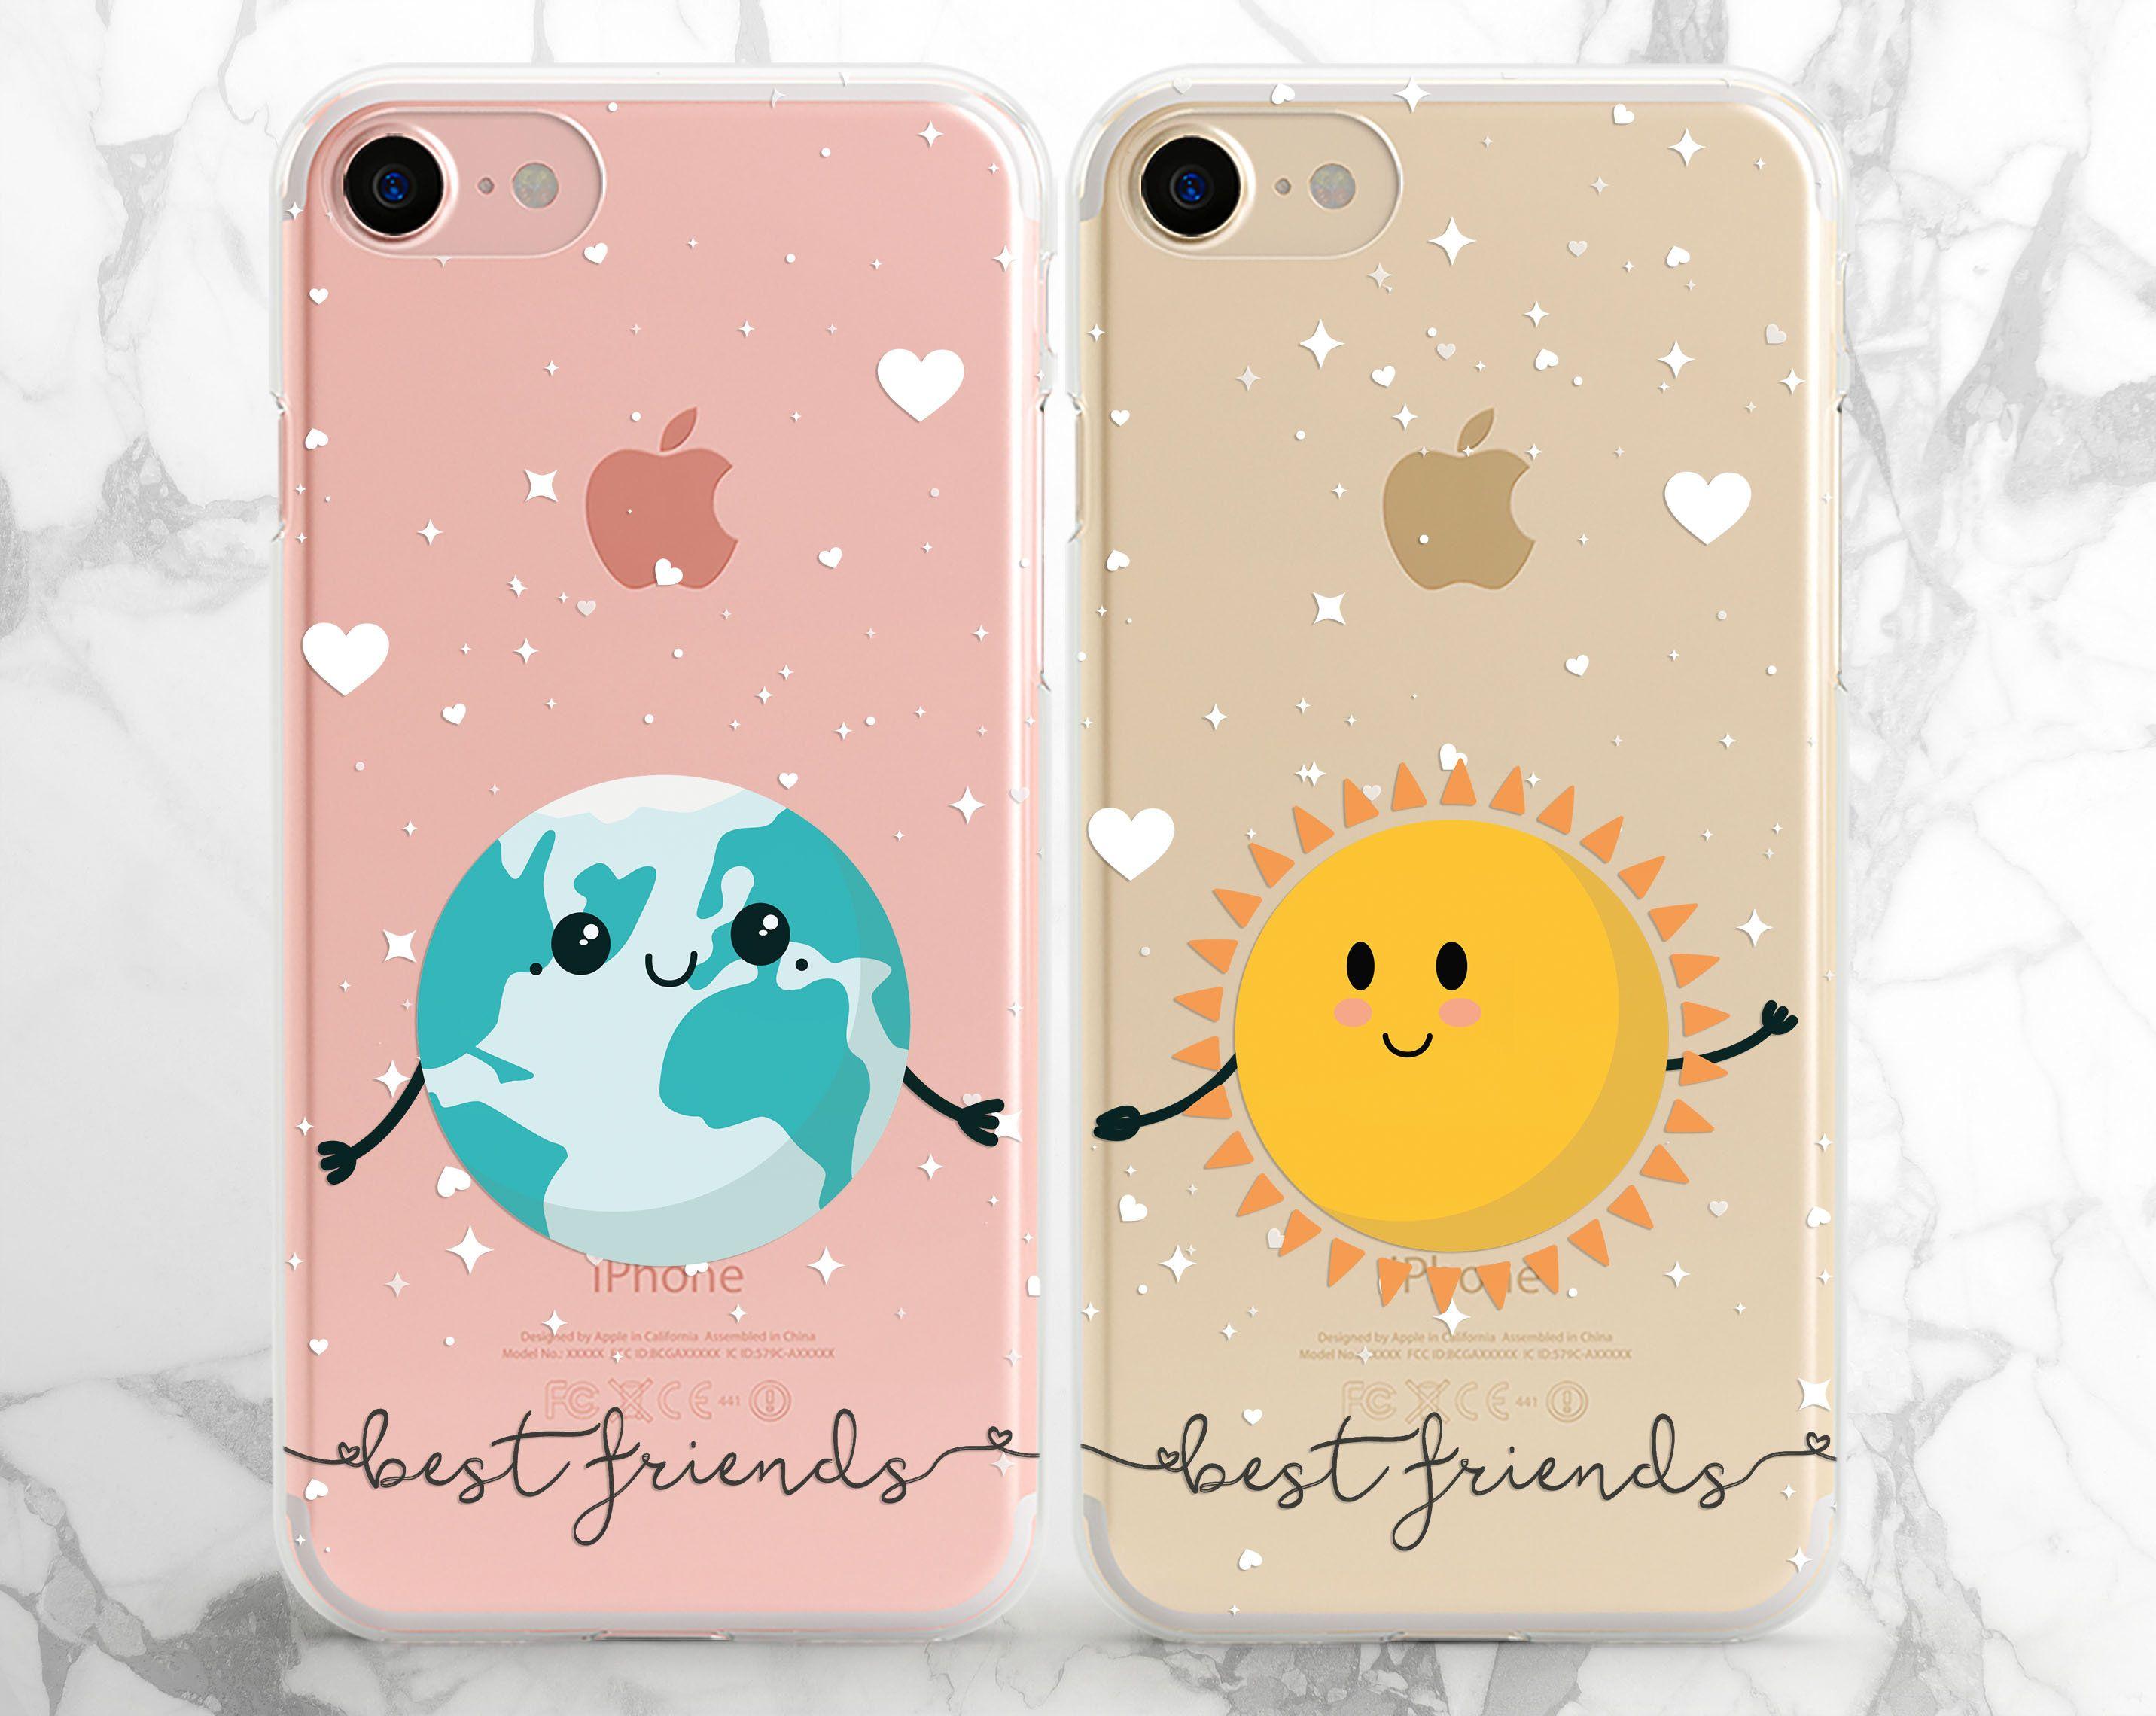 Best Friends Cases Iphone Couple Case Iphone Cute Case Xs Max Etsy Friends Phone Case Case Iphone Couple Bff Phone Cases Iphone